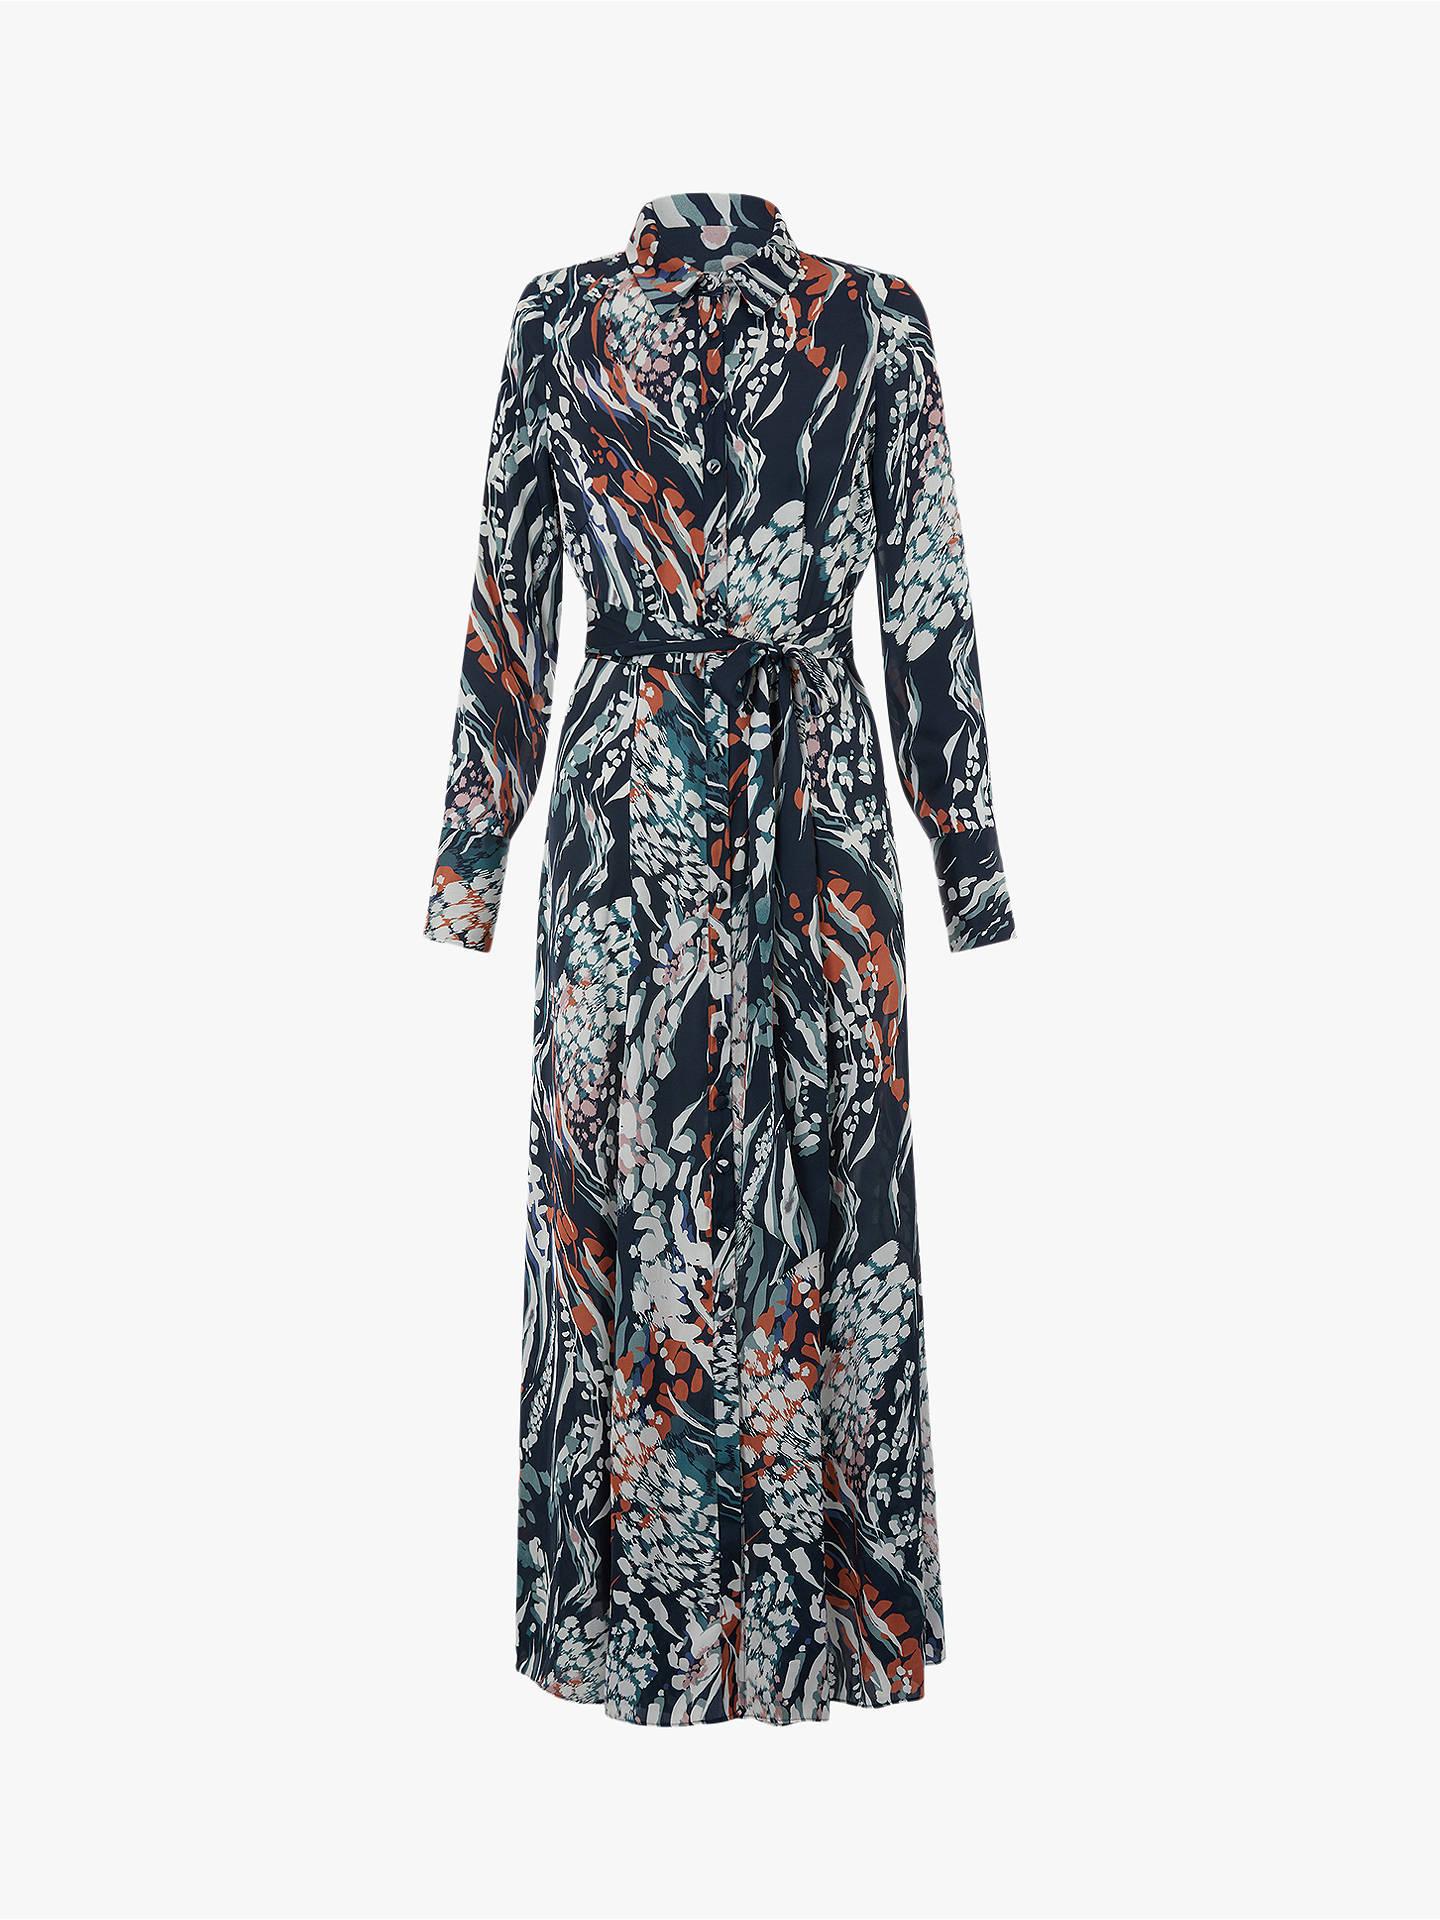 2747975f86d9 ... Buy Monsoon Larna Leopard Print Dress, Brown, 8 Online at johnlewis.com  ...